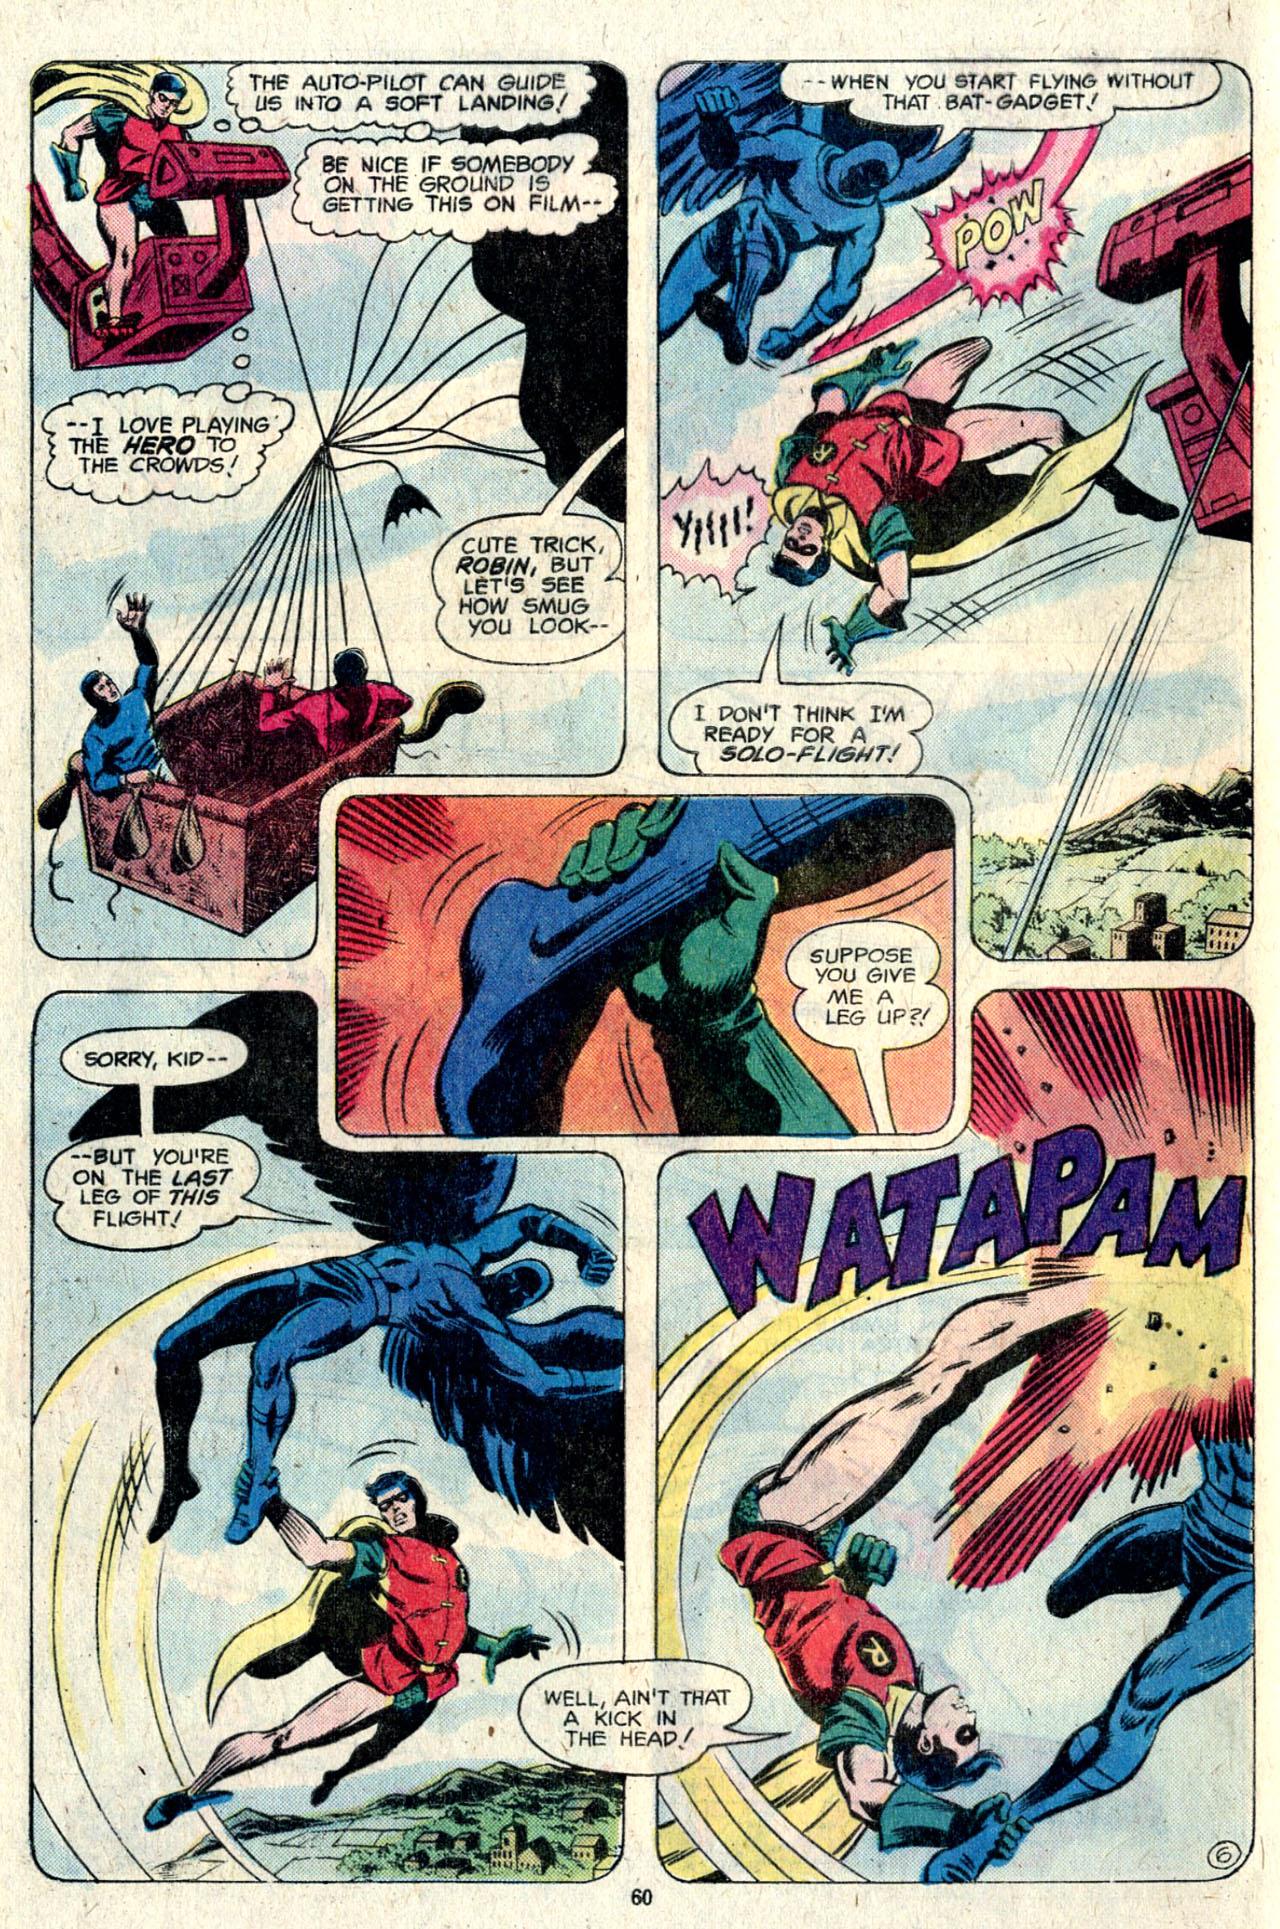 Detective Comics (1937) 482 Page 60